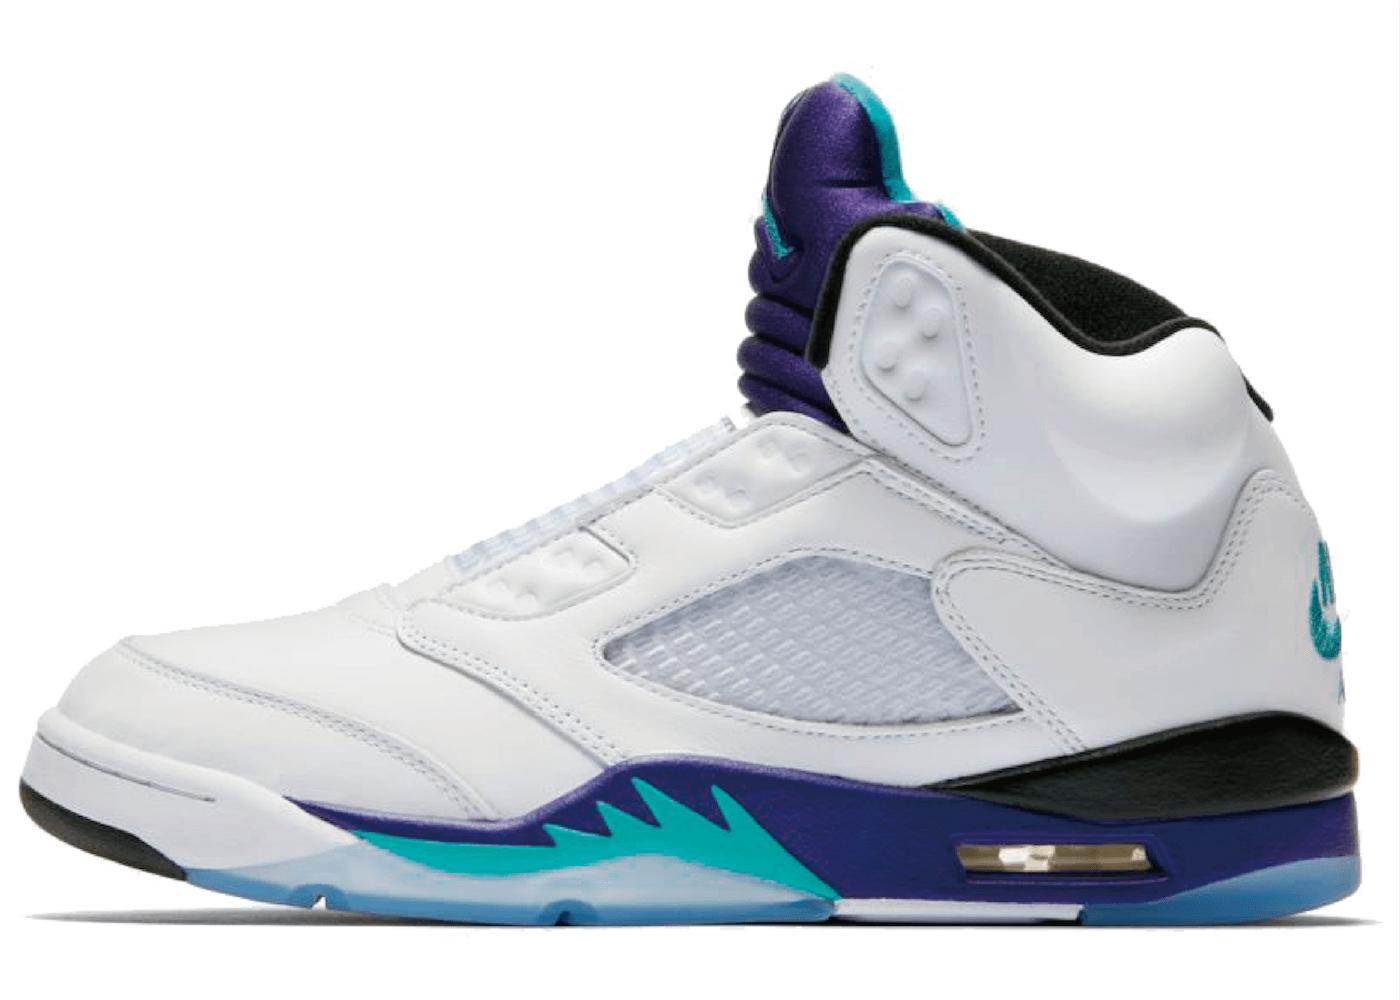 Nike Air Jordan 5 Retro Grape Fresh Princeの写真